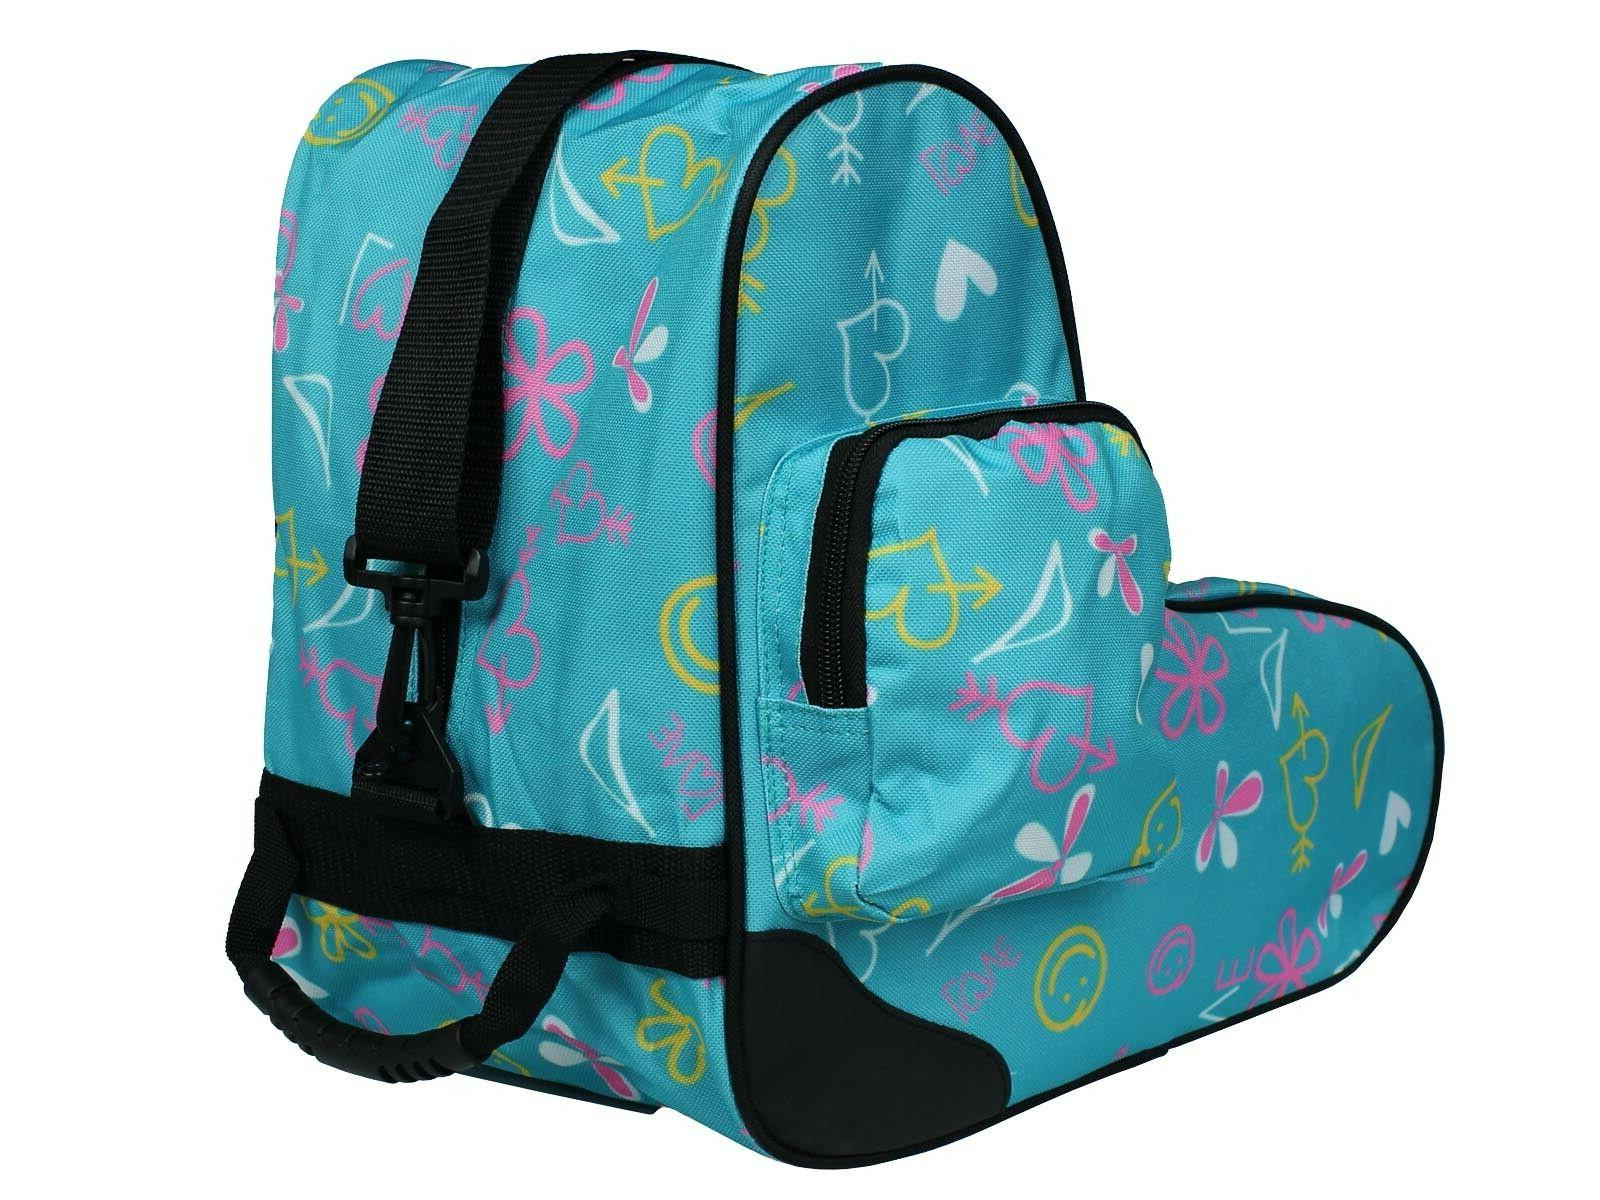 EPIC Limited Edition Blue Graffiti Love Quad Speed Roller Skate Bag